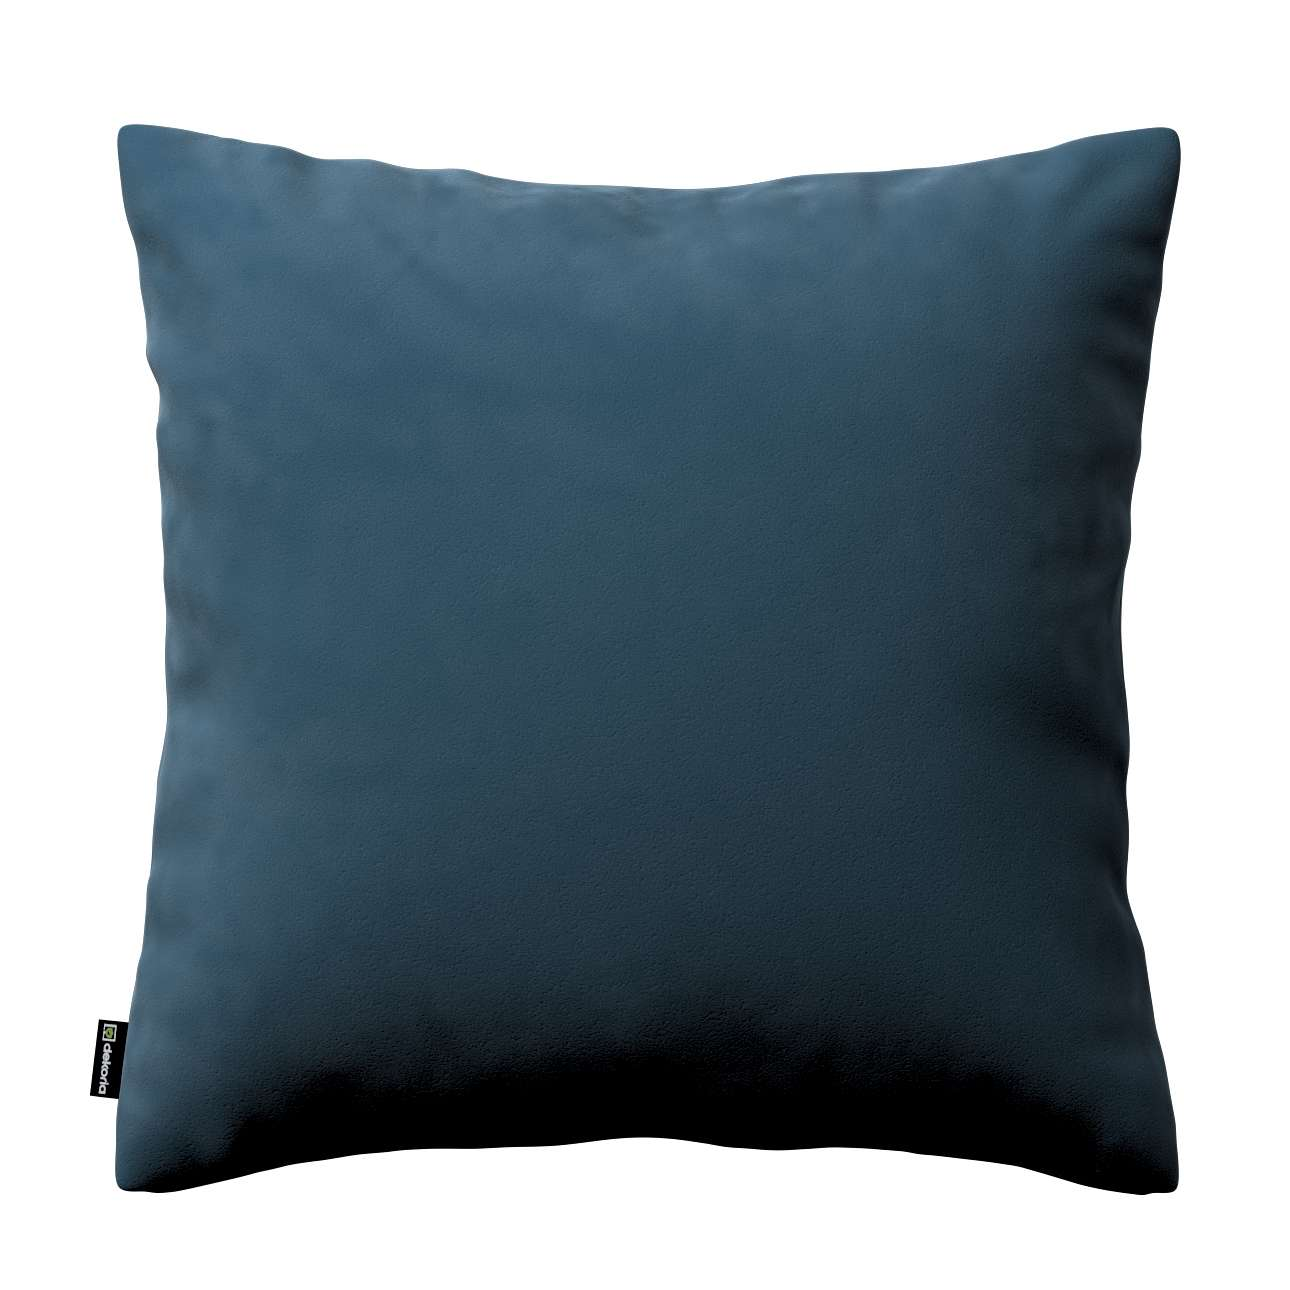 Kuddfodral standard i kollektionen Velvet, Tyg: 704-16